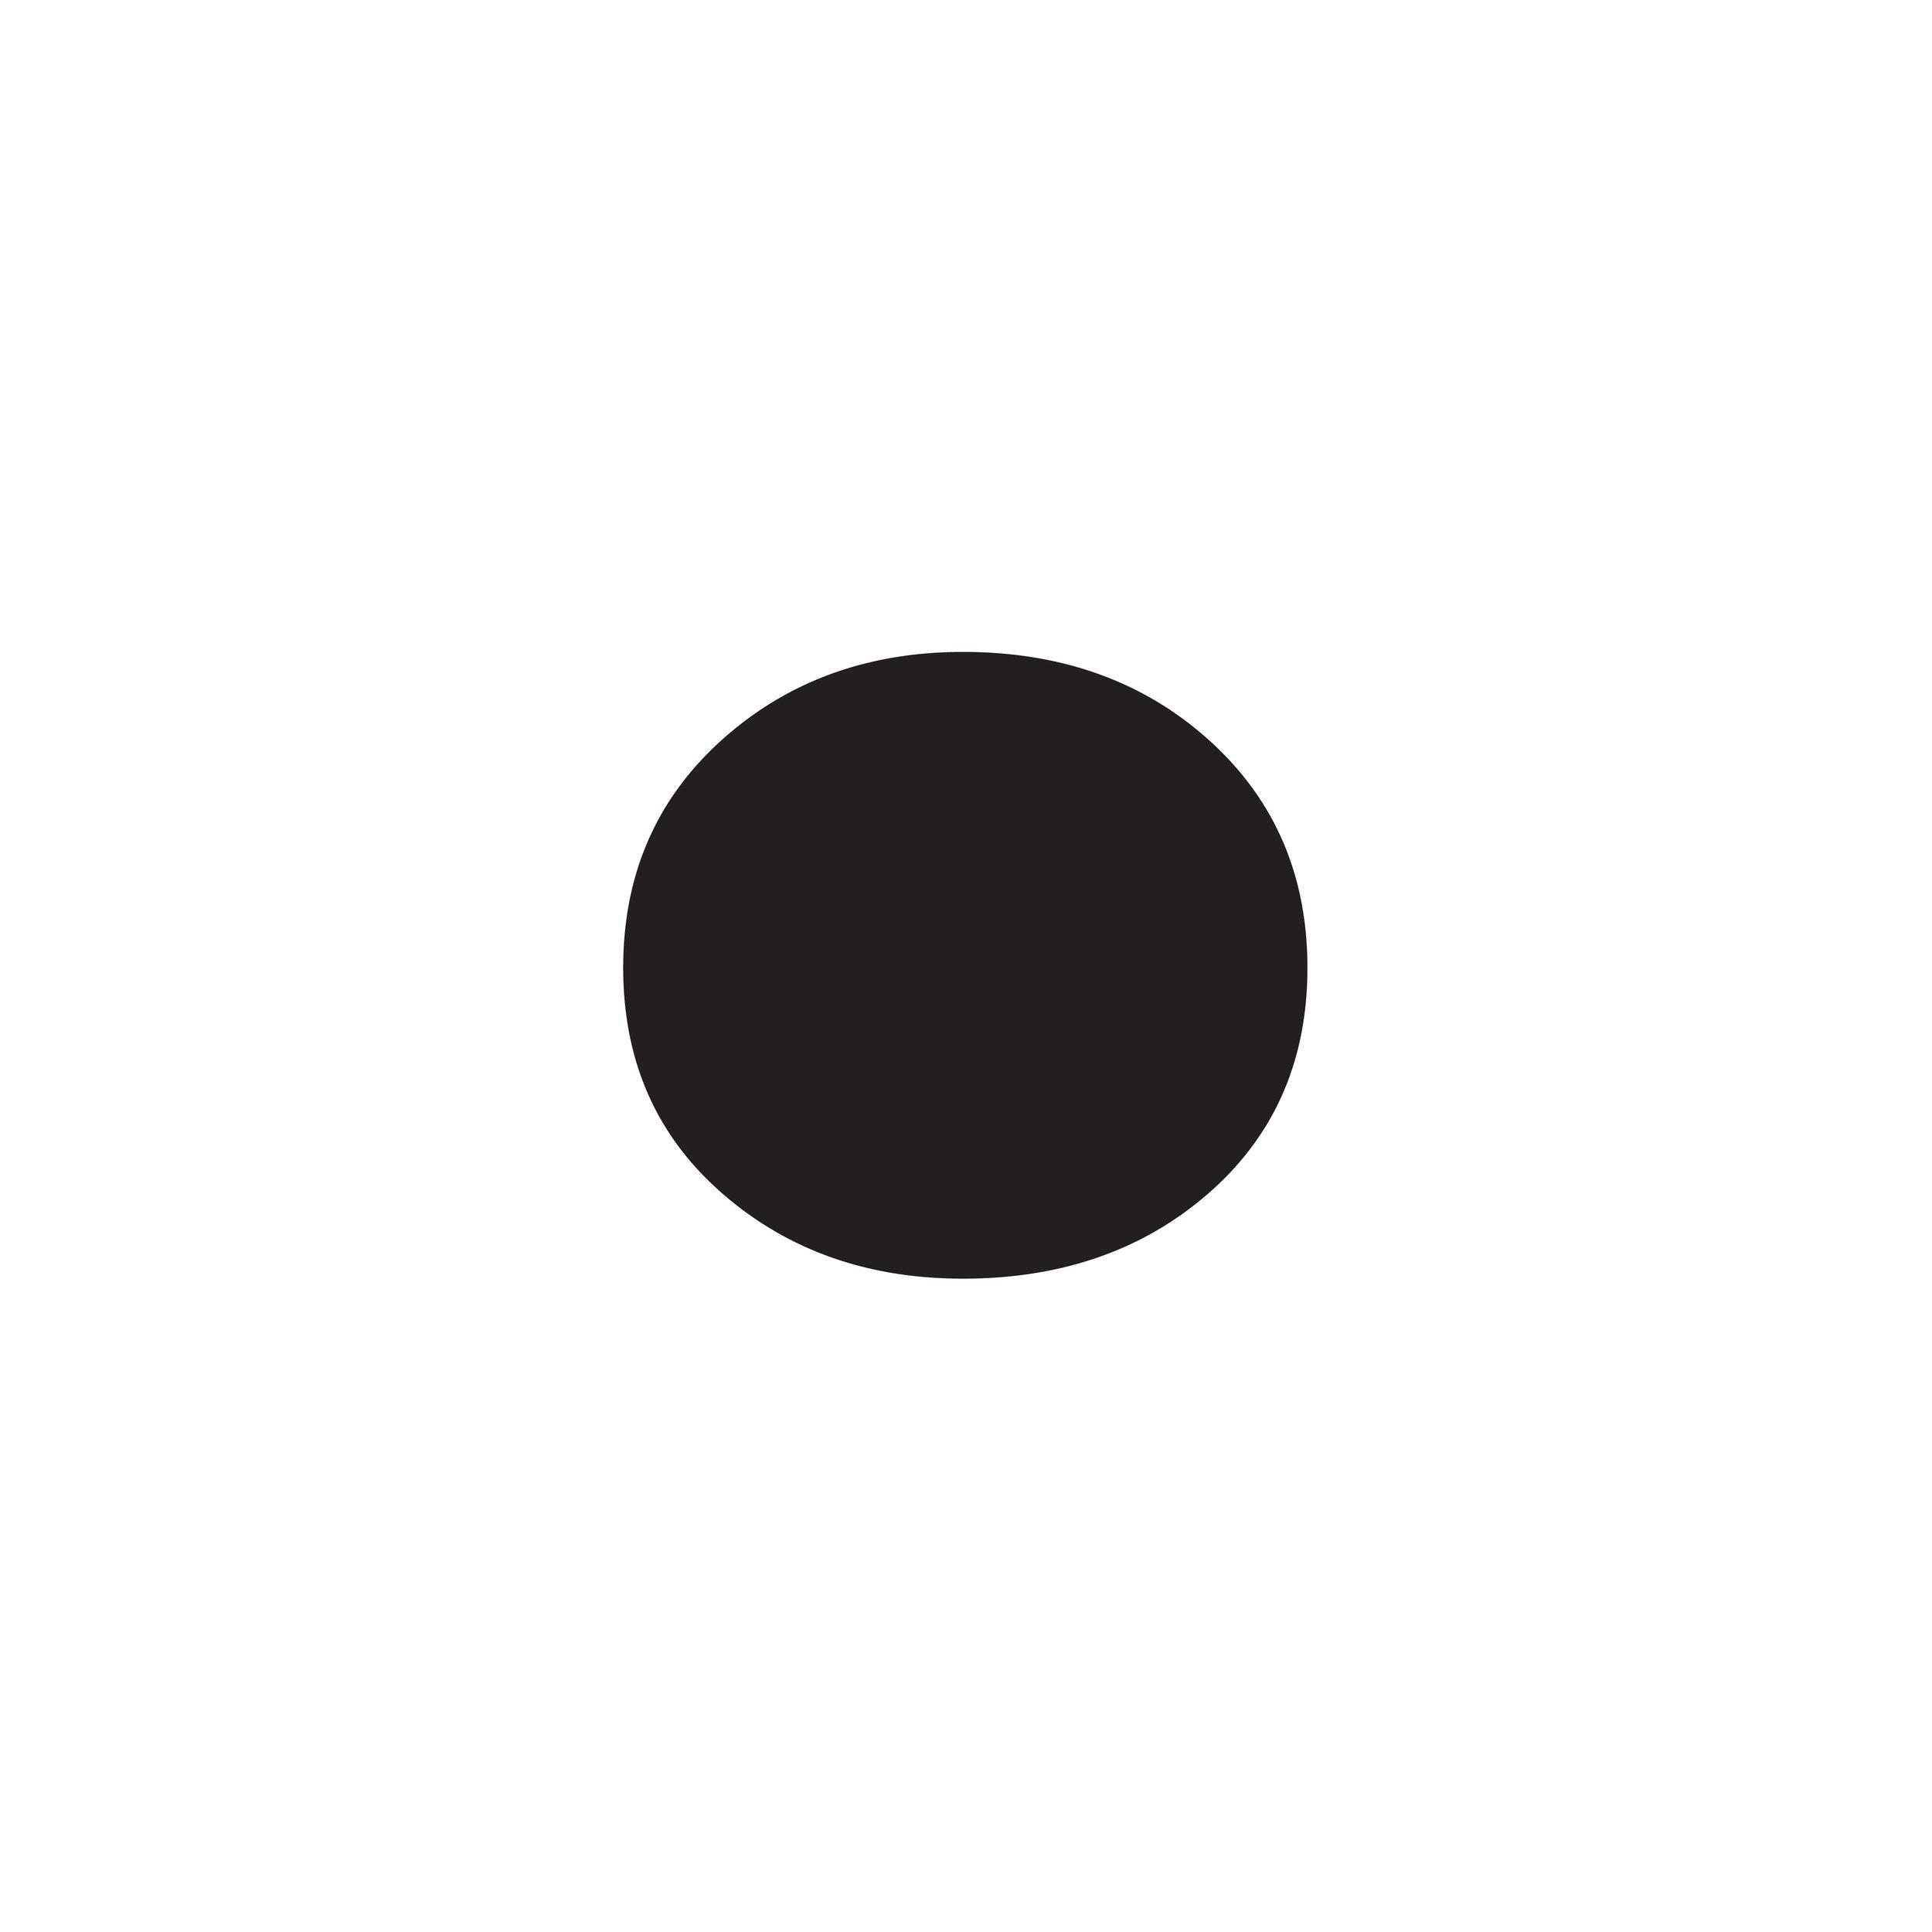 Dot_black-01.jpg